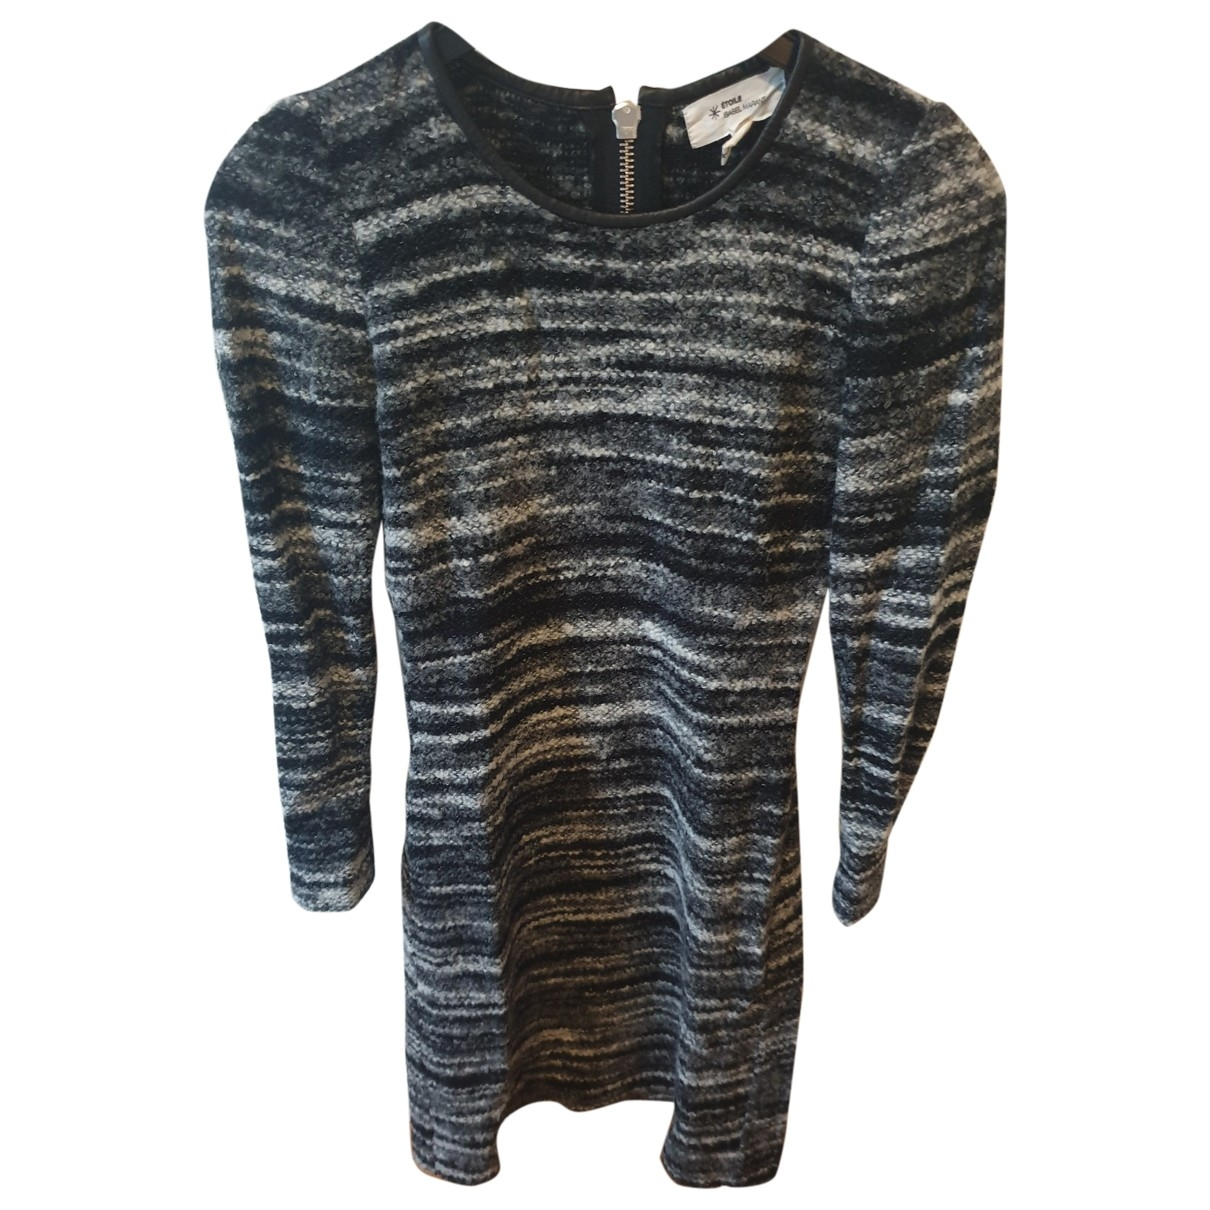 Isabel Marant Etoile \N Grey Wool dress for Women 1 0-5